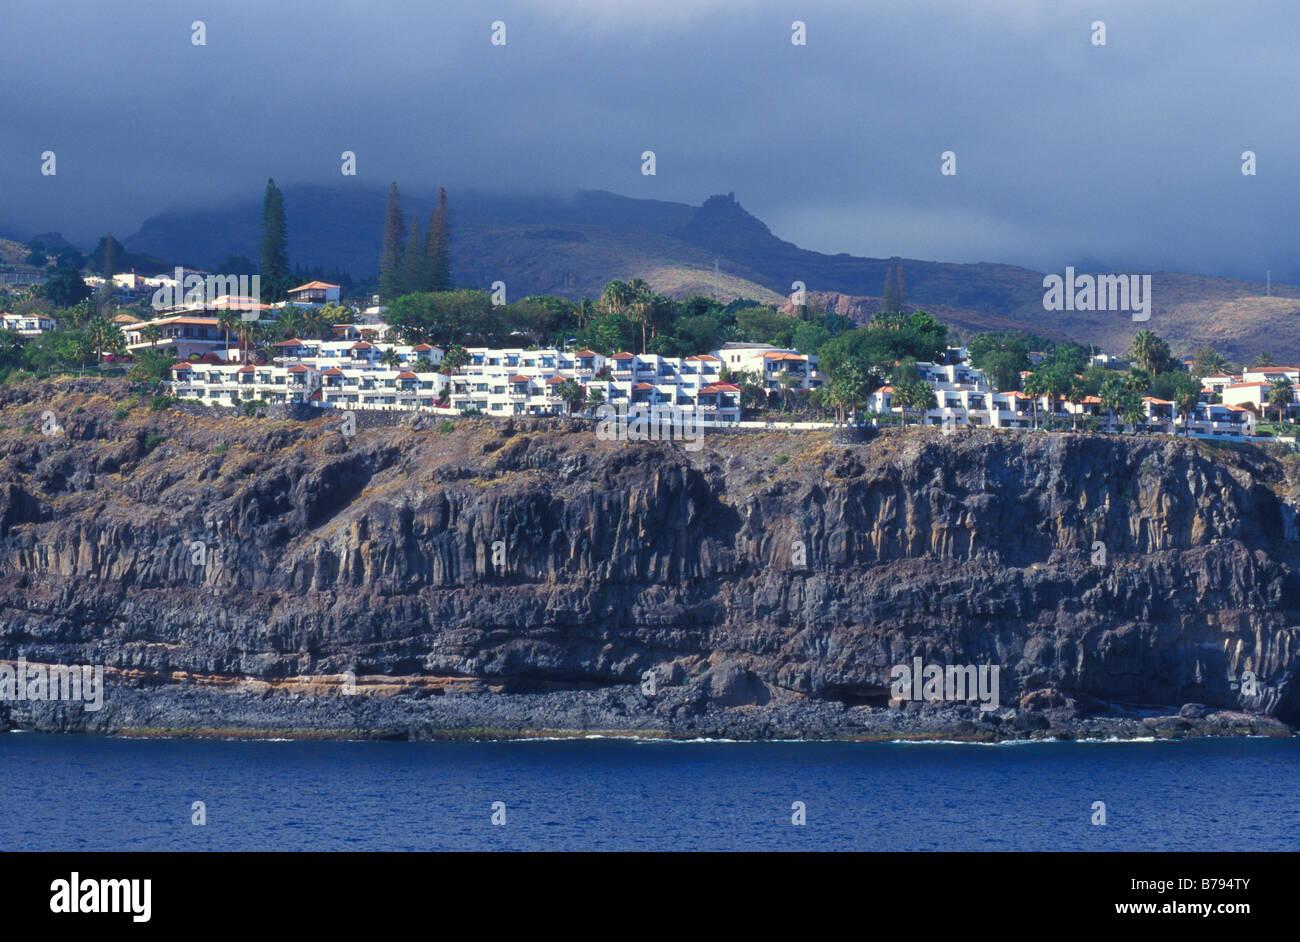 Hotel Jardin Tecina Playa De Santiago L Ile De La Gomera Canary